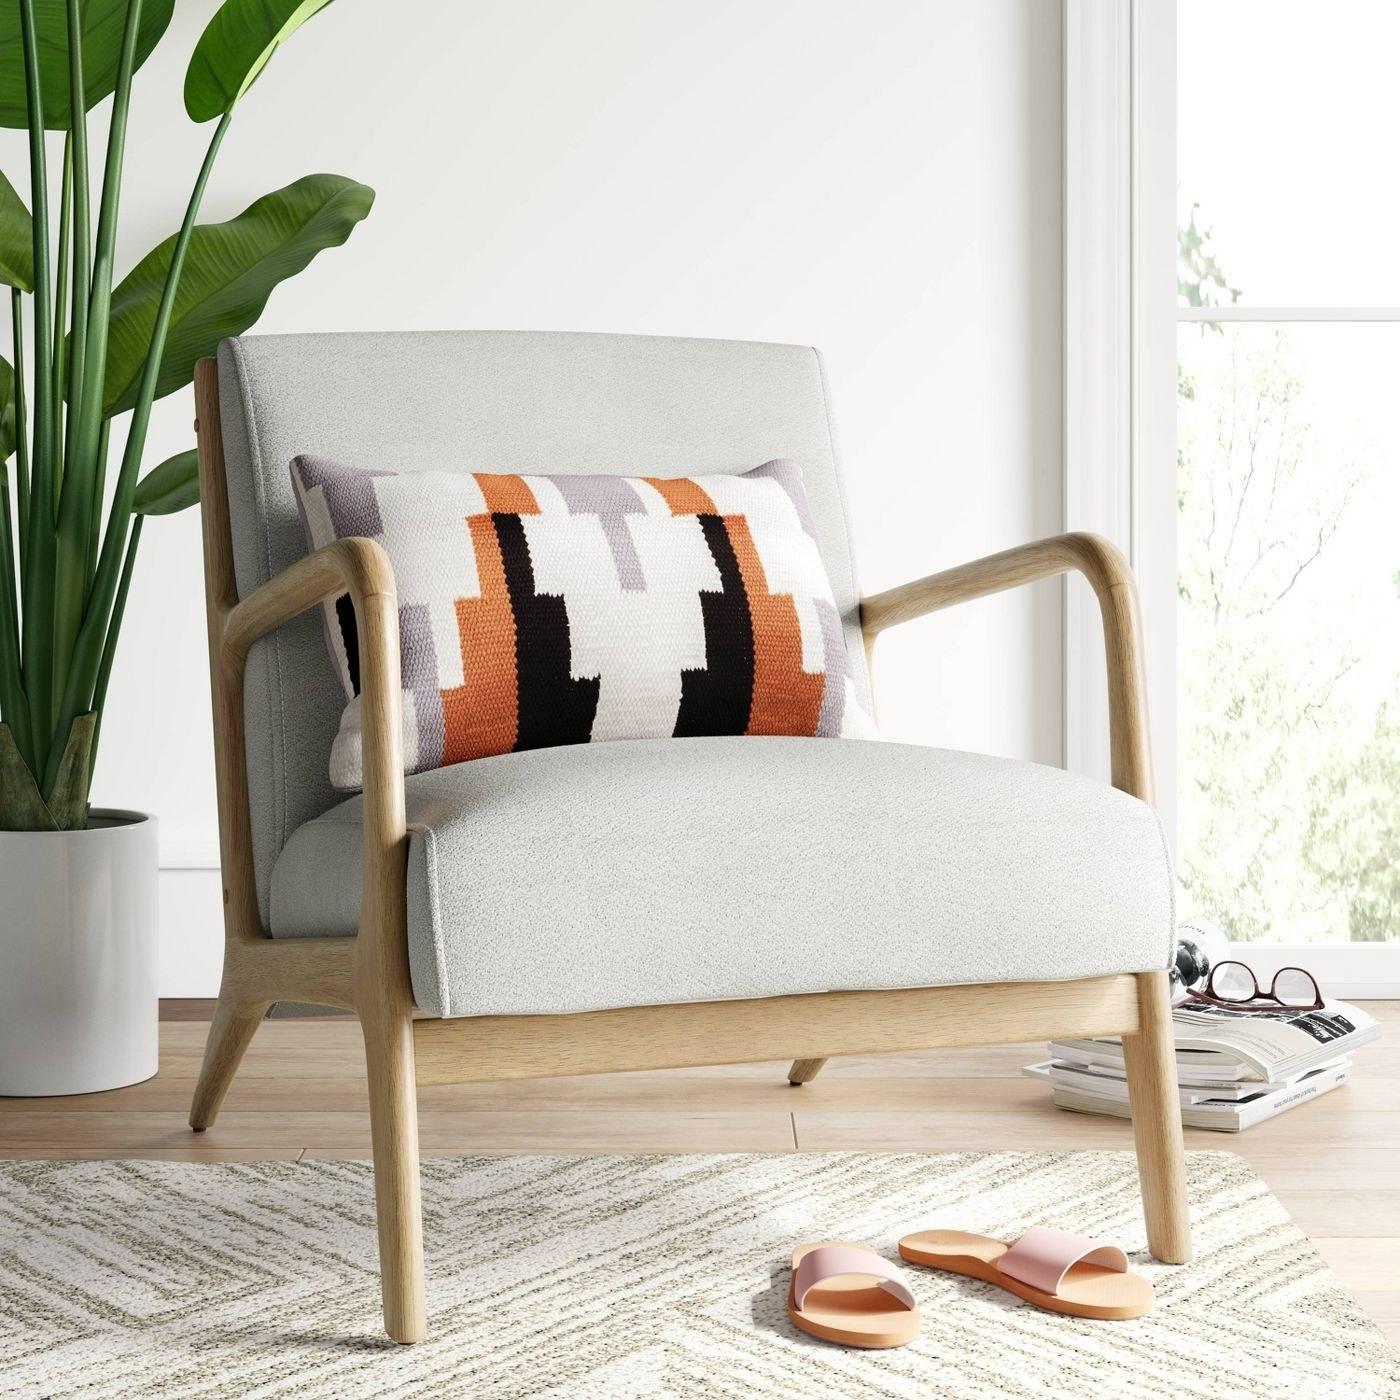 A white chair in a home